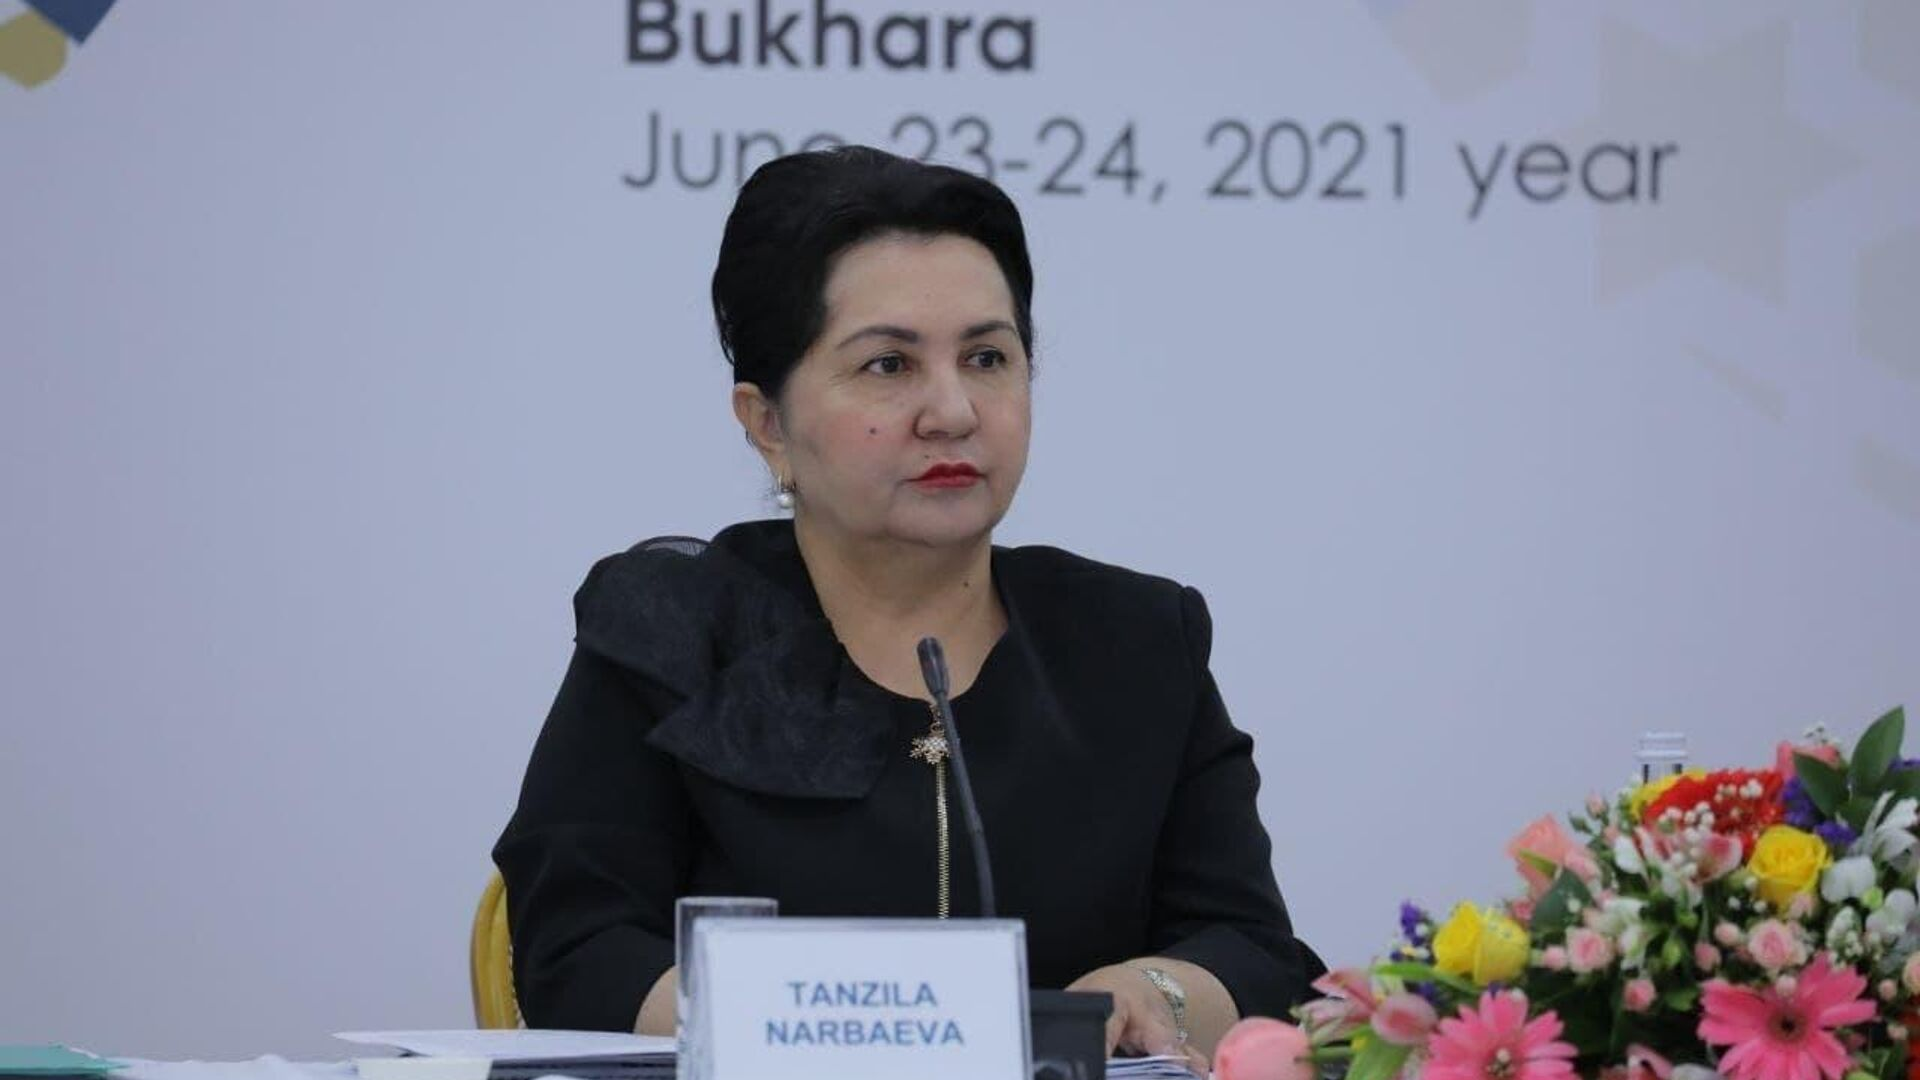 Председатель Сената Олий Мажлиса Танзила Нарбаева - Sputnik Узбекистан, 1920, 24.06.2021